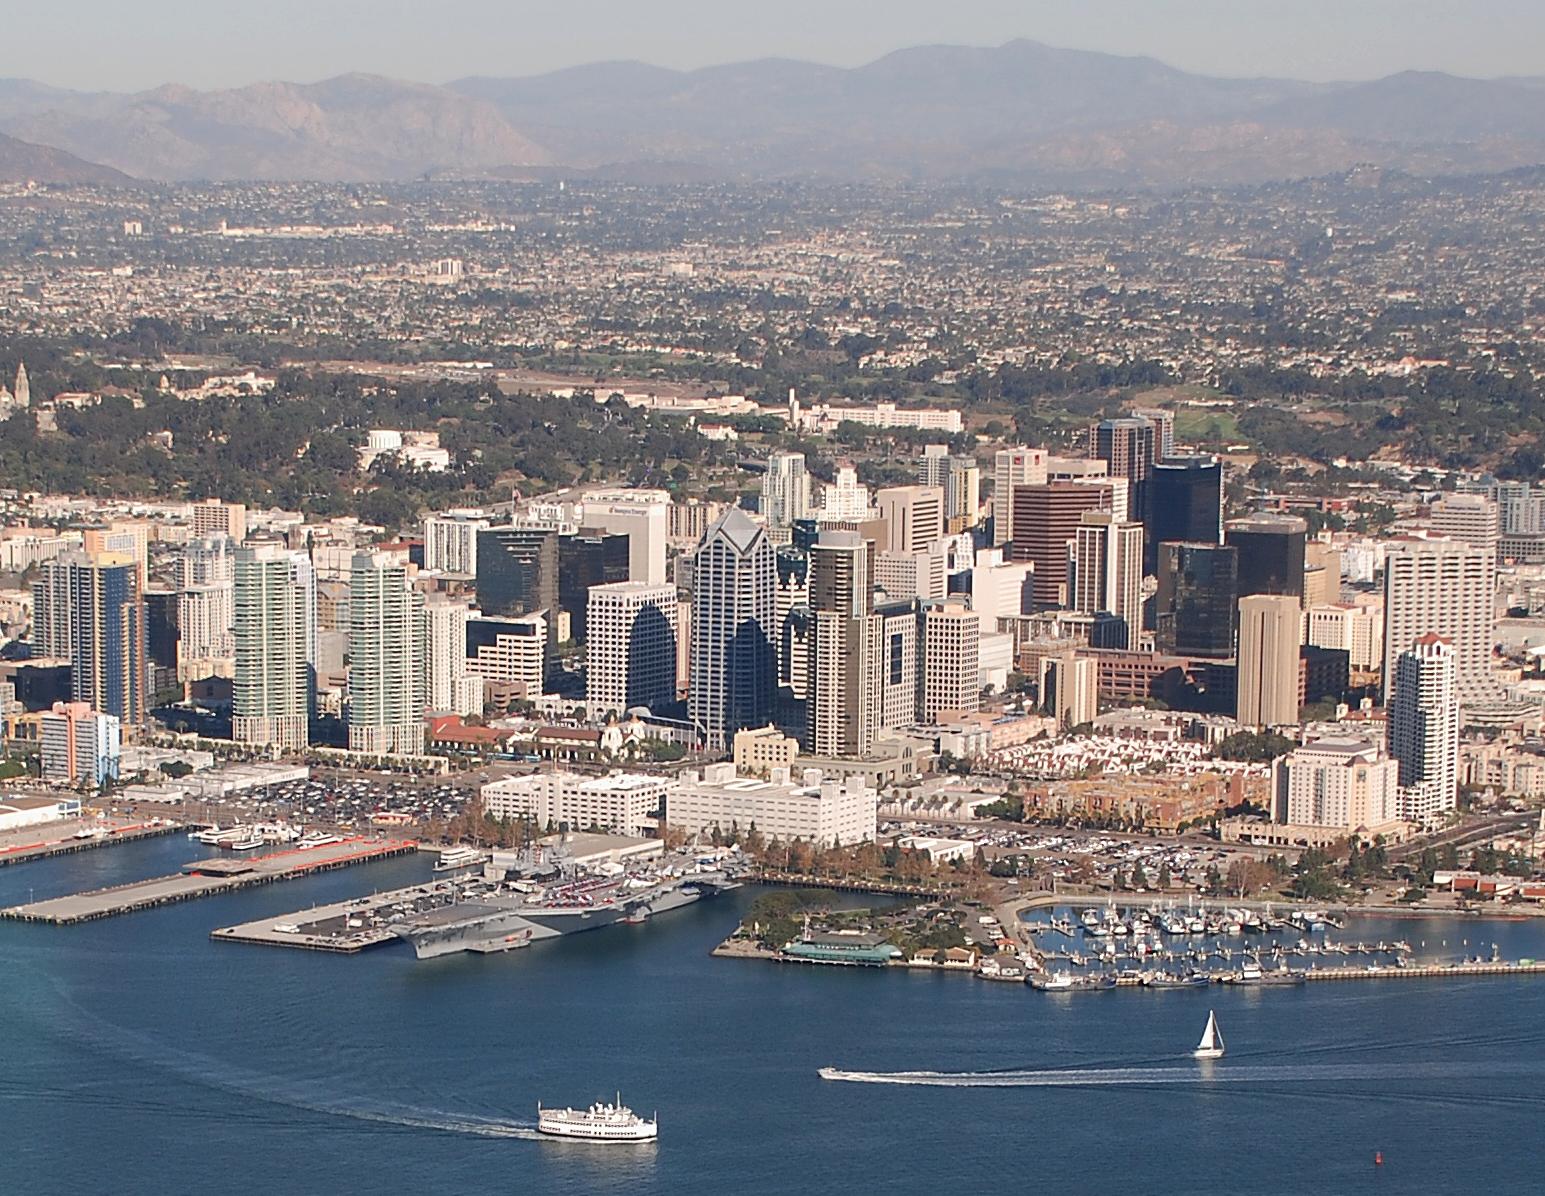 San diego california apartment association - Apartment buildings san diego ...